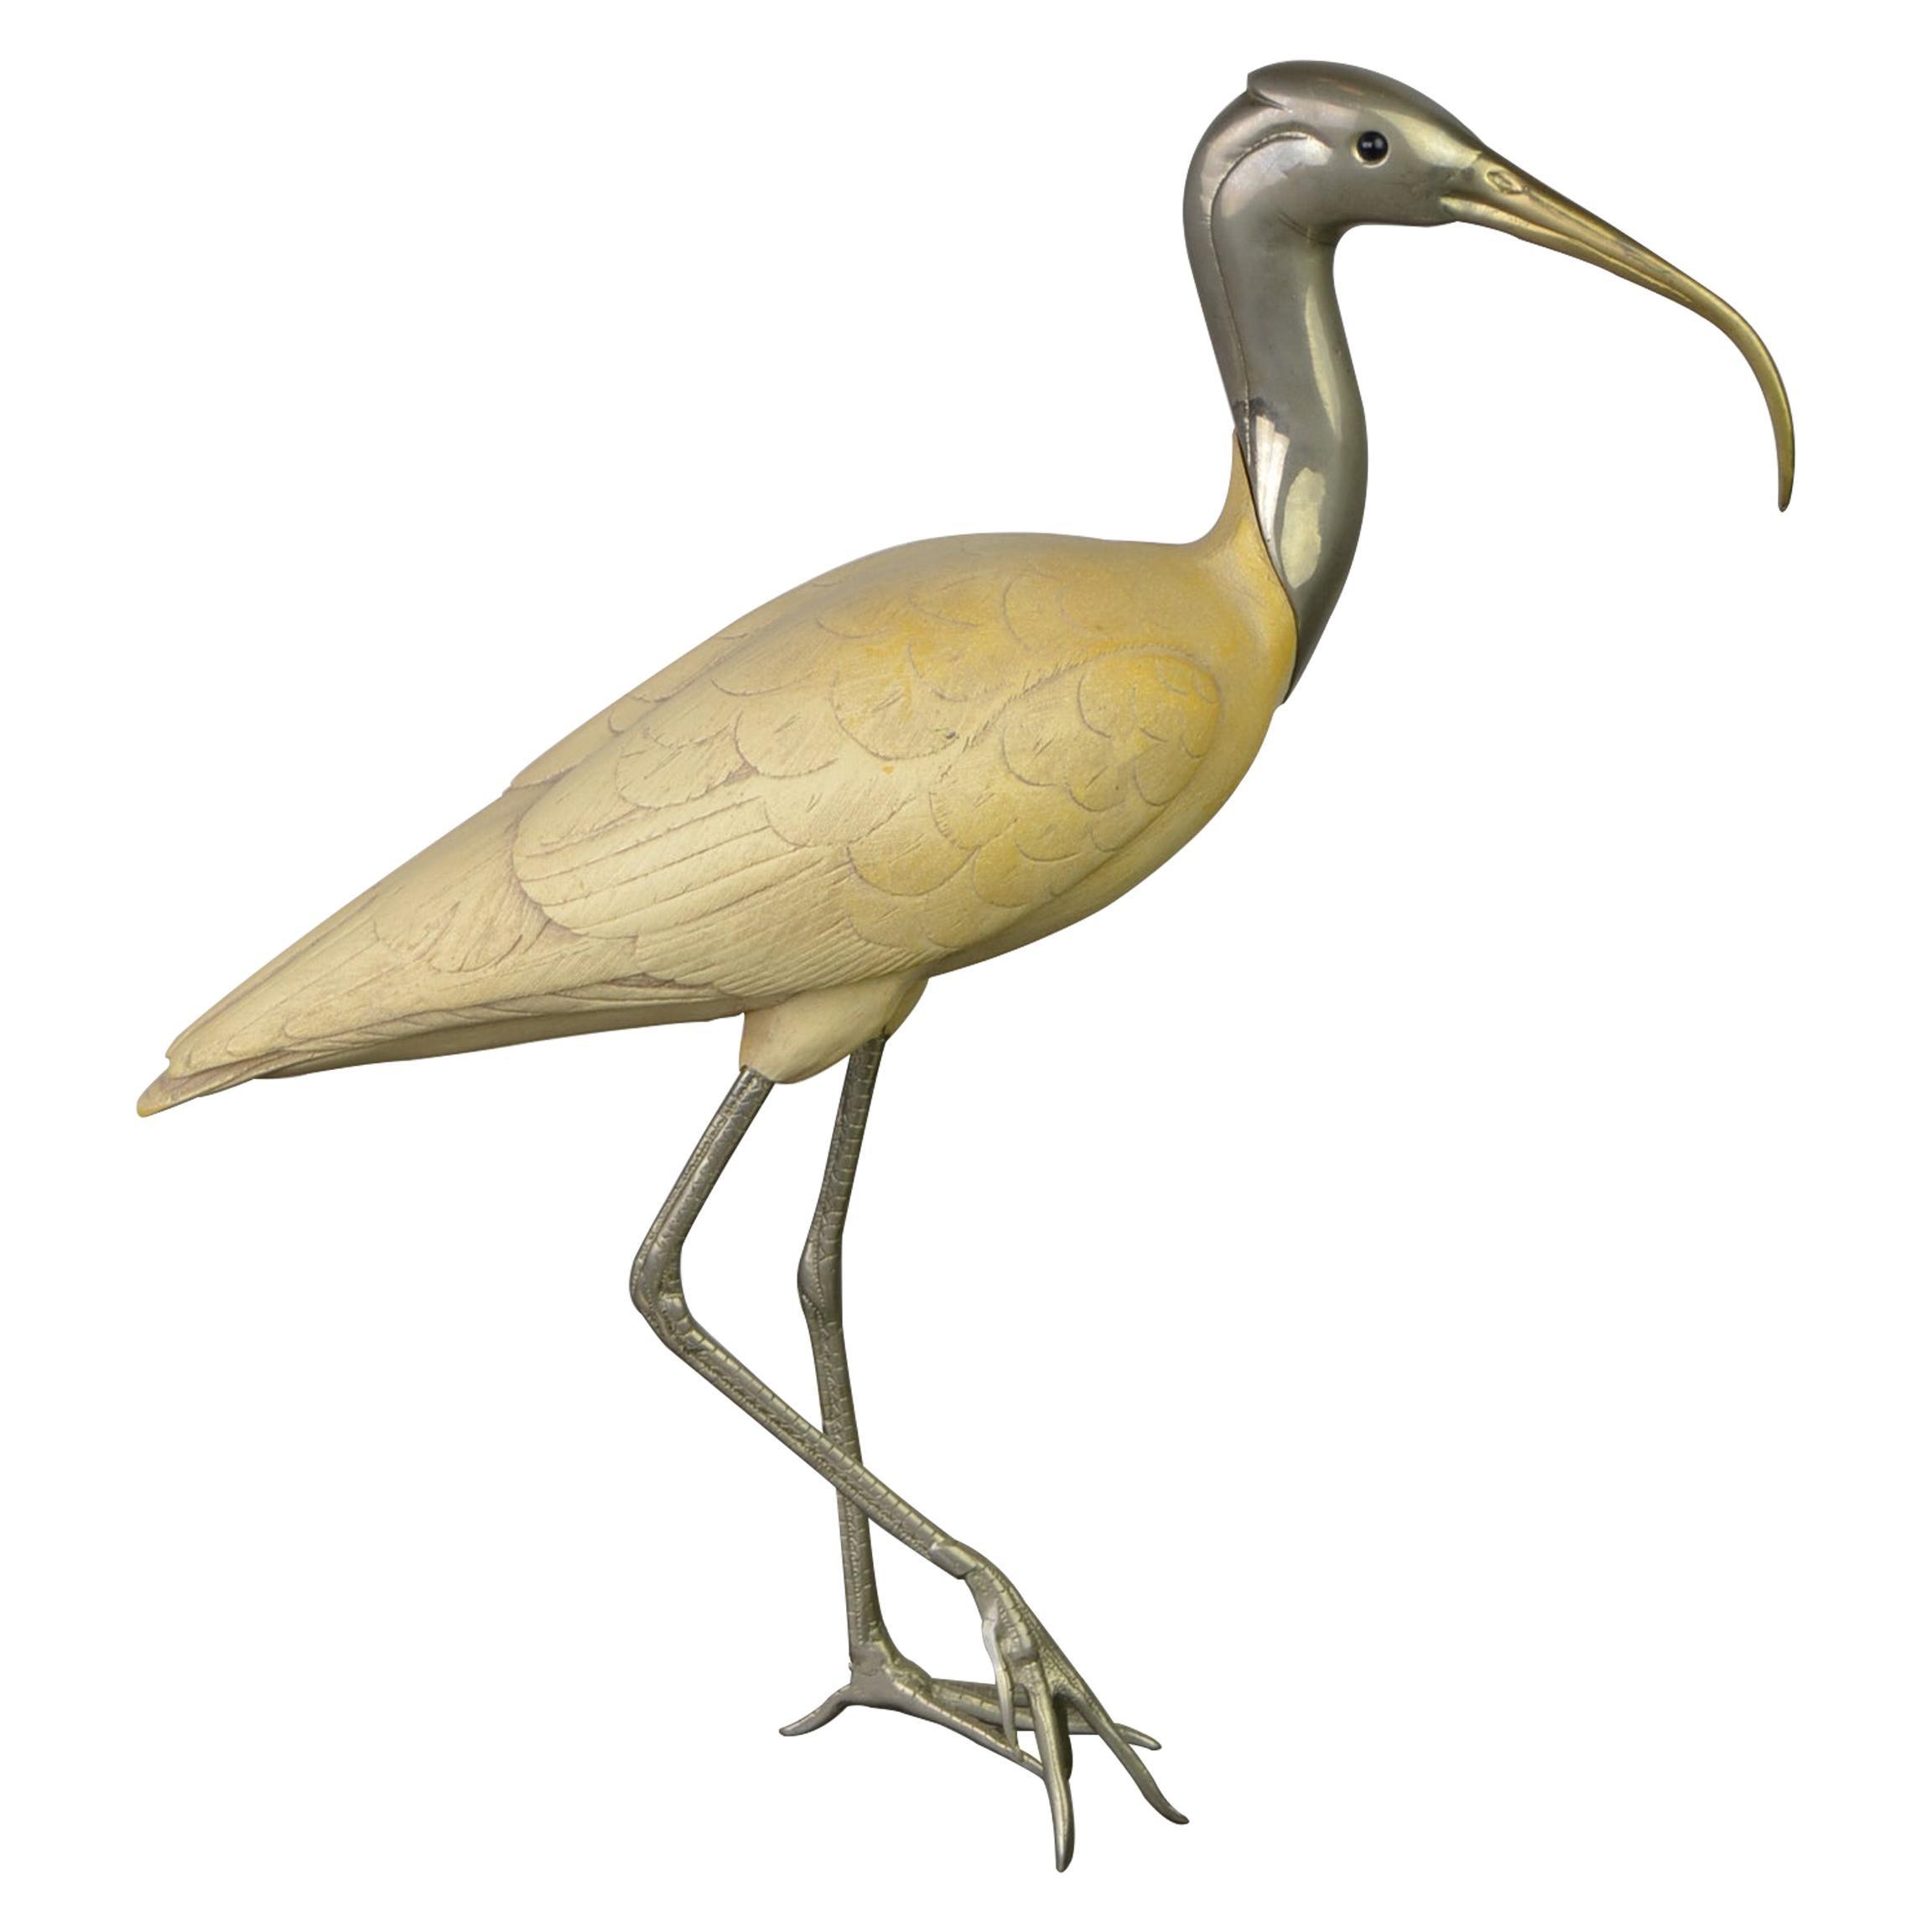 Metal Bird Sculptures - 46 For Sale on 1stdibs